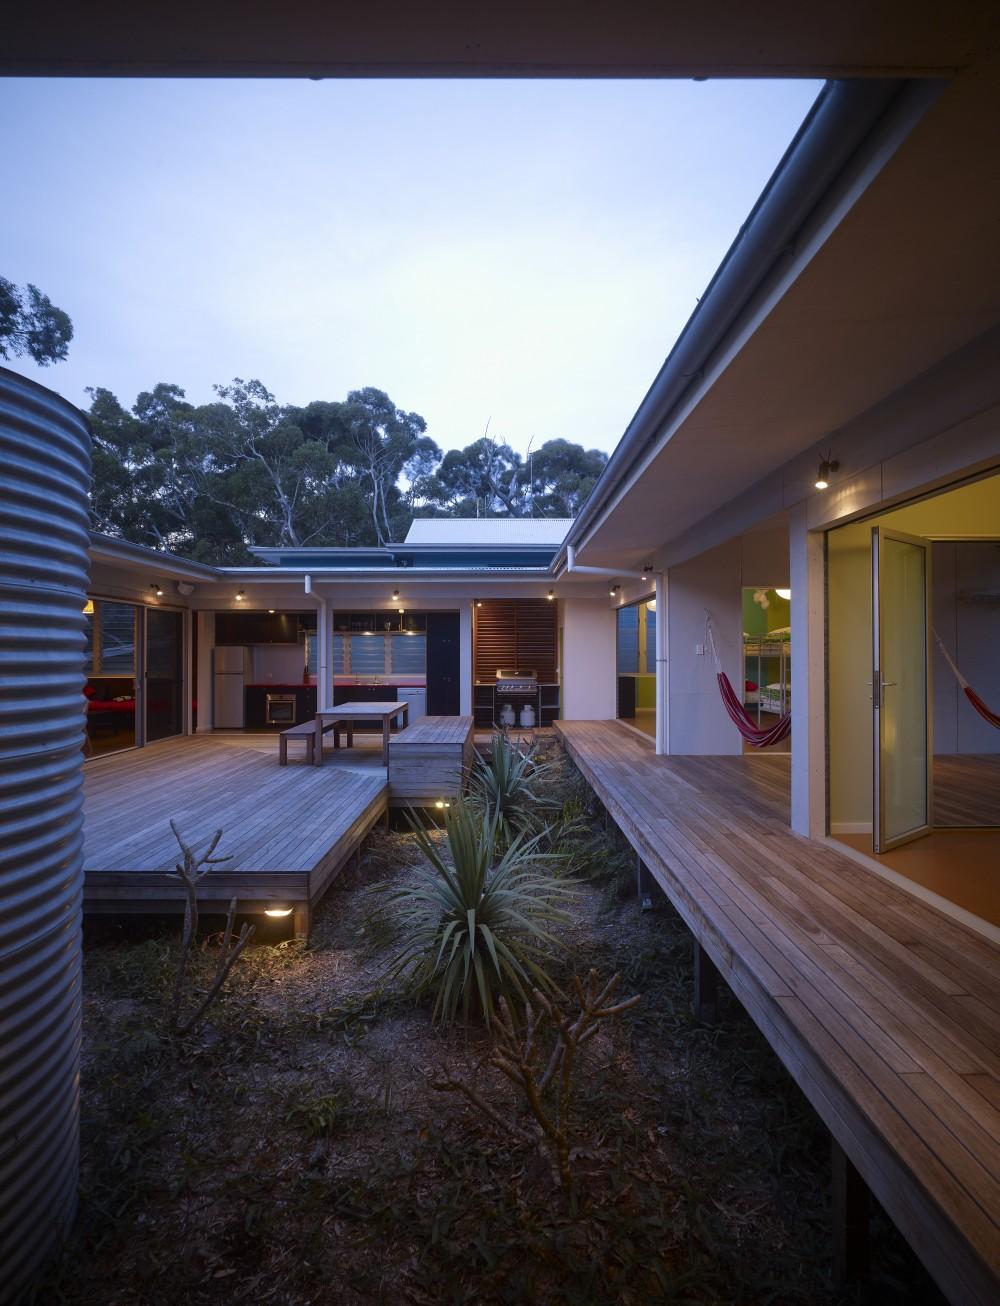 Design Inspiration: The Modern Courtyard House - Studio MM ... on Backyard:uuezyx-Hy-8= Landscape Design  id=77788